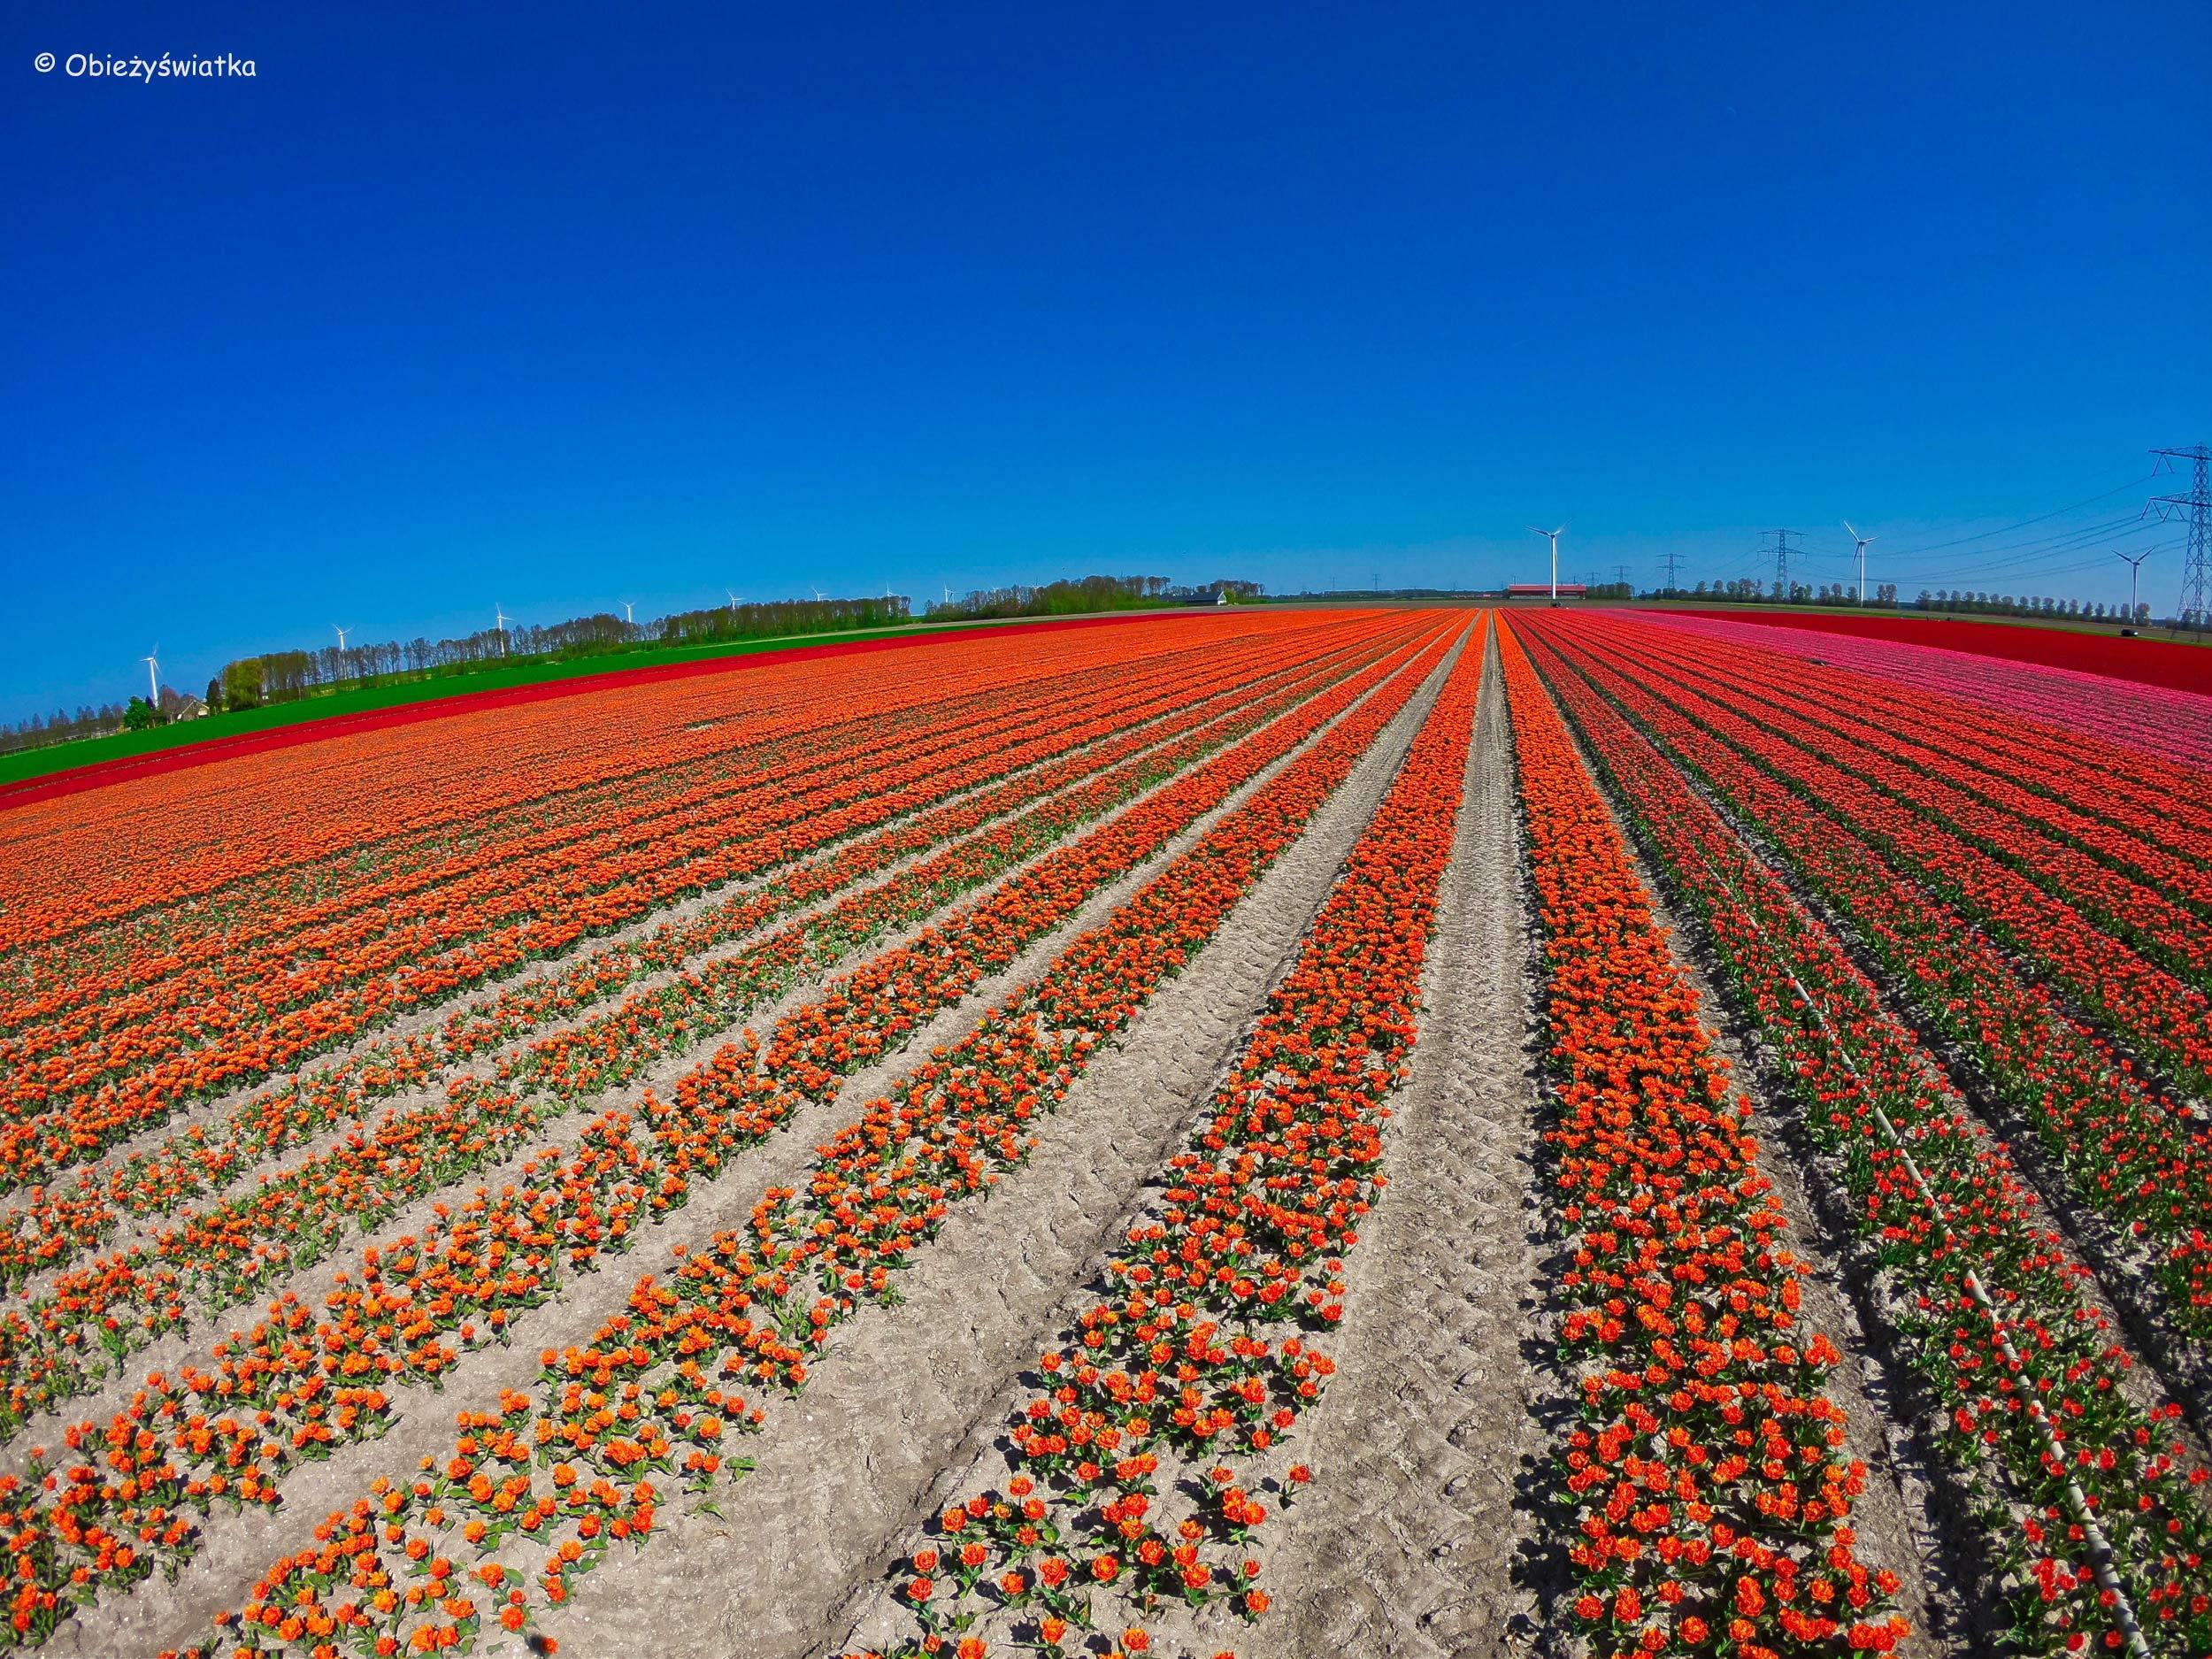 Tulipanowe żniwa :)